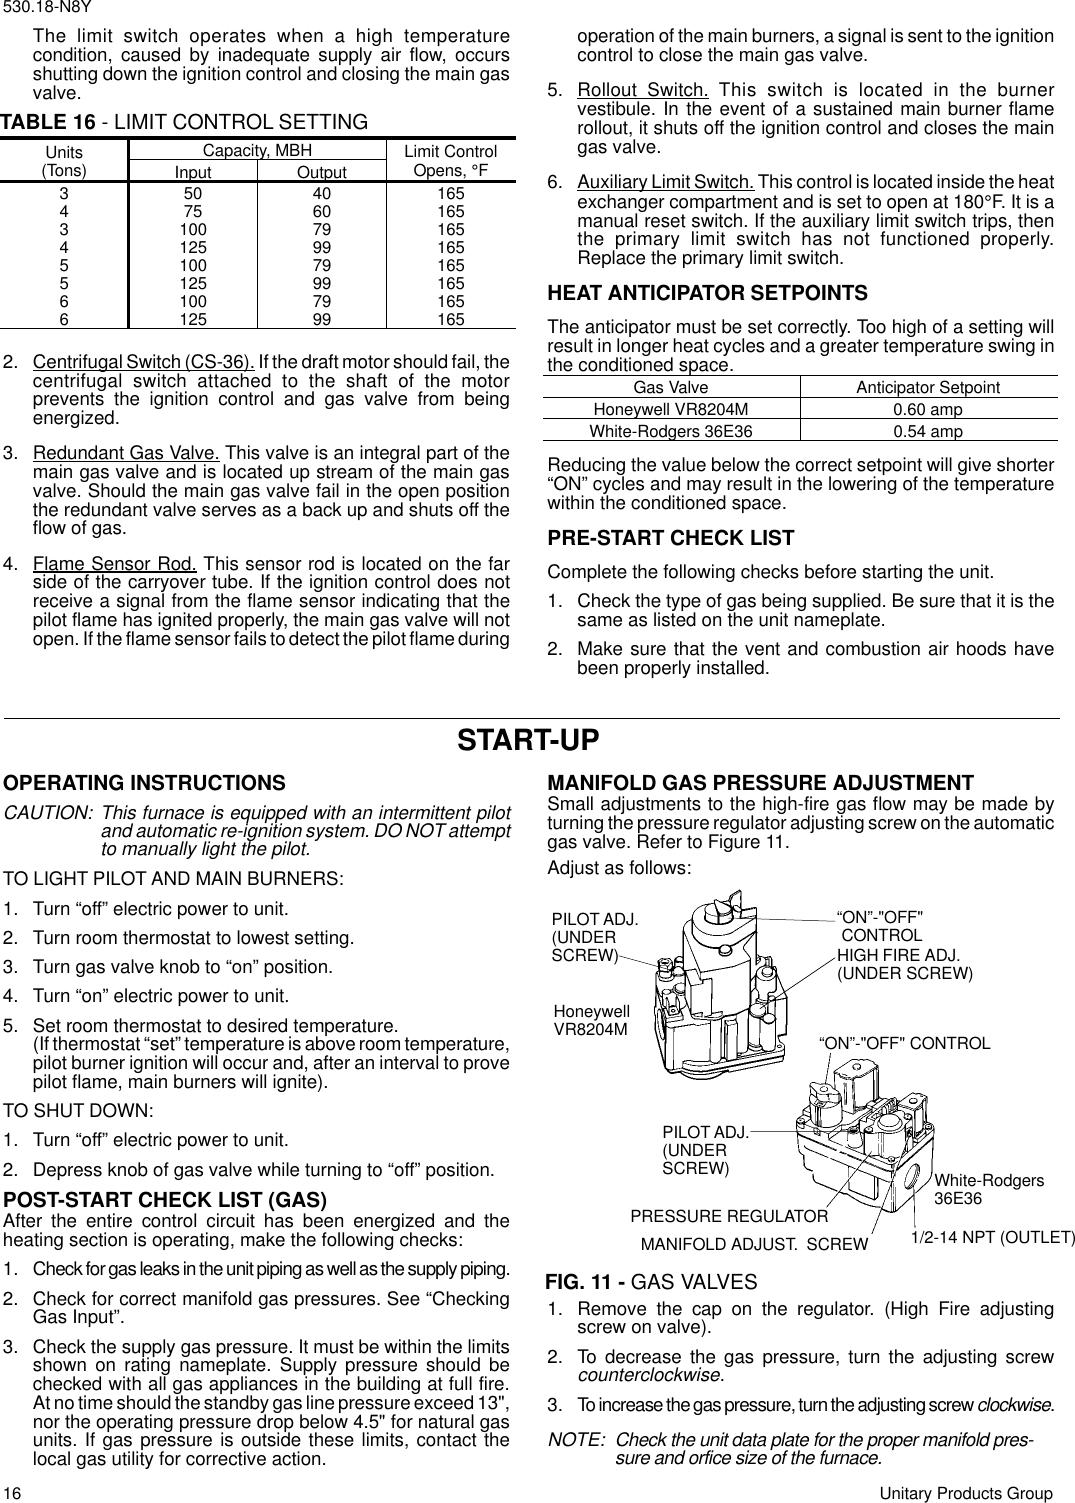 York Sunline 2000 D2Cg 072 Users Manual DCG INSTALLATION